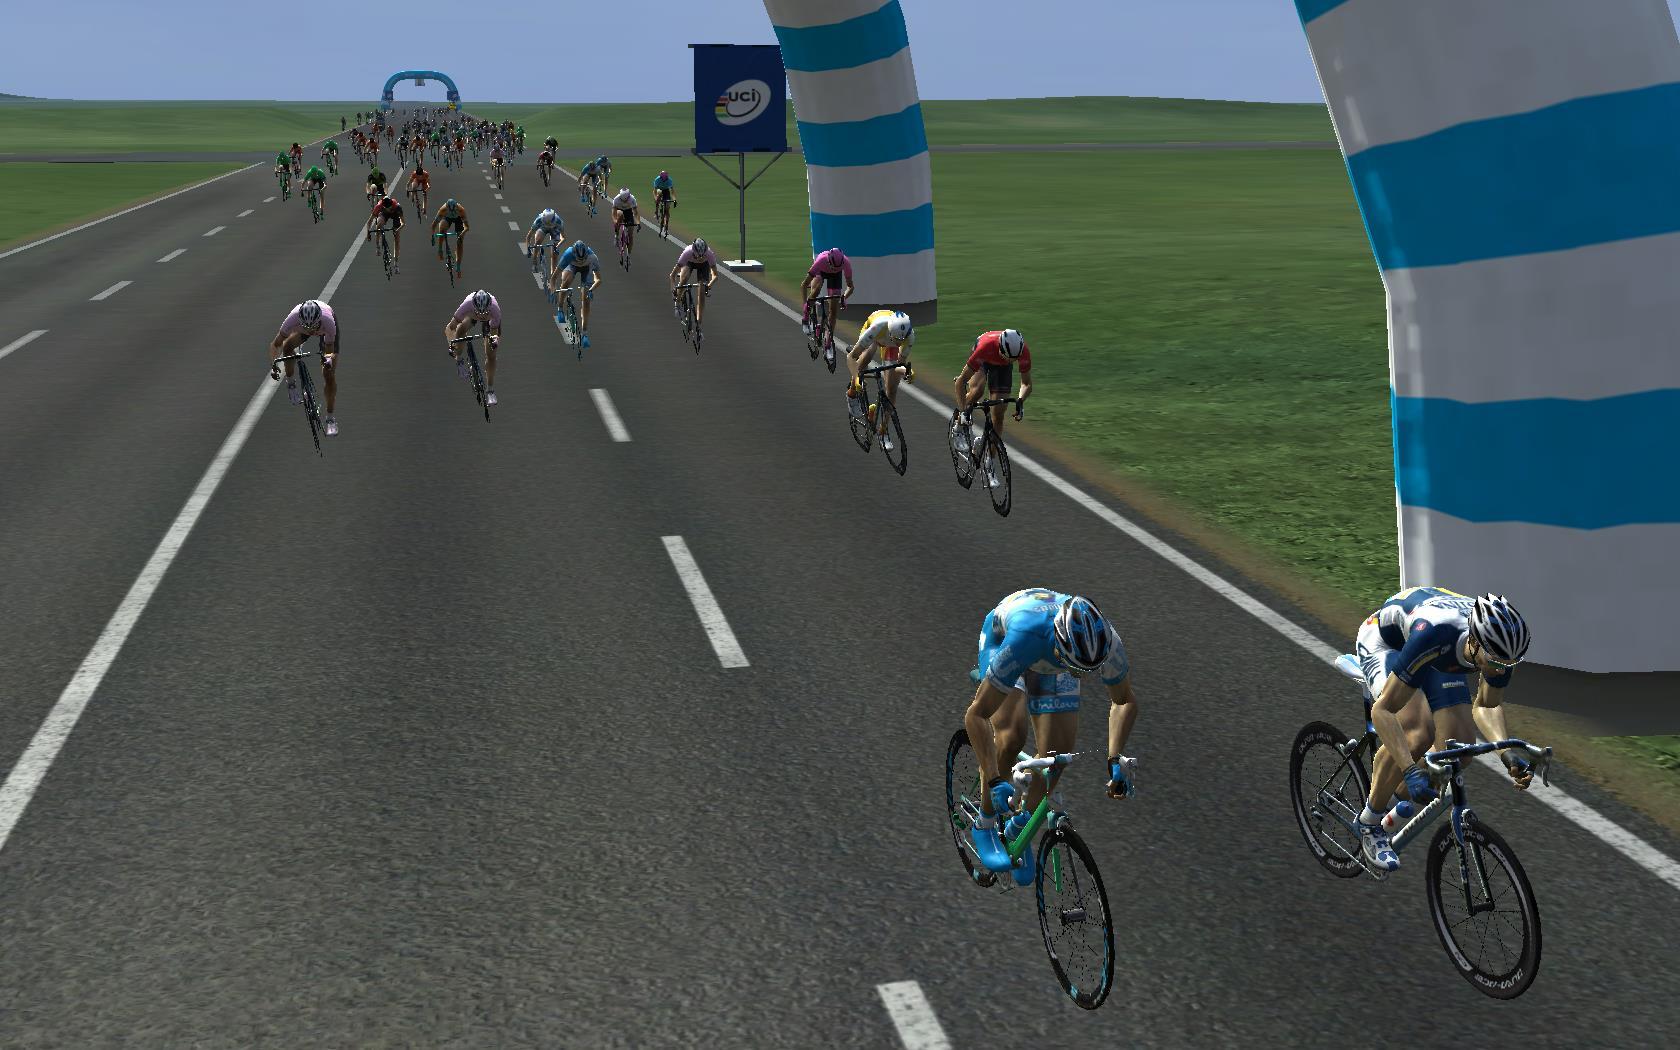 pcmdaily.com/images/mg/2018/Races/C2/USAPCC/1/PCM0013.jpg